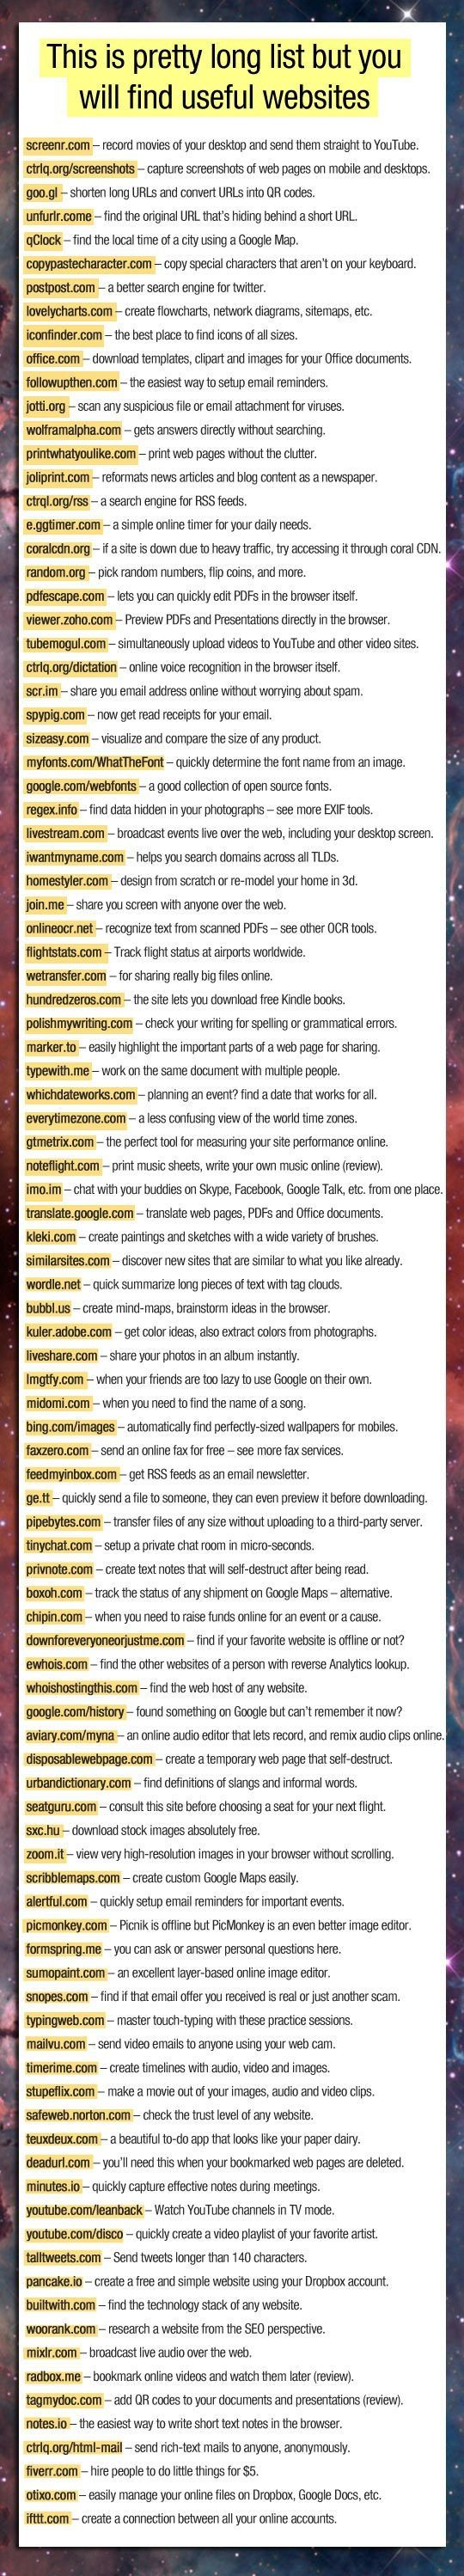 Long list of useful websites